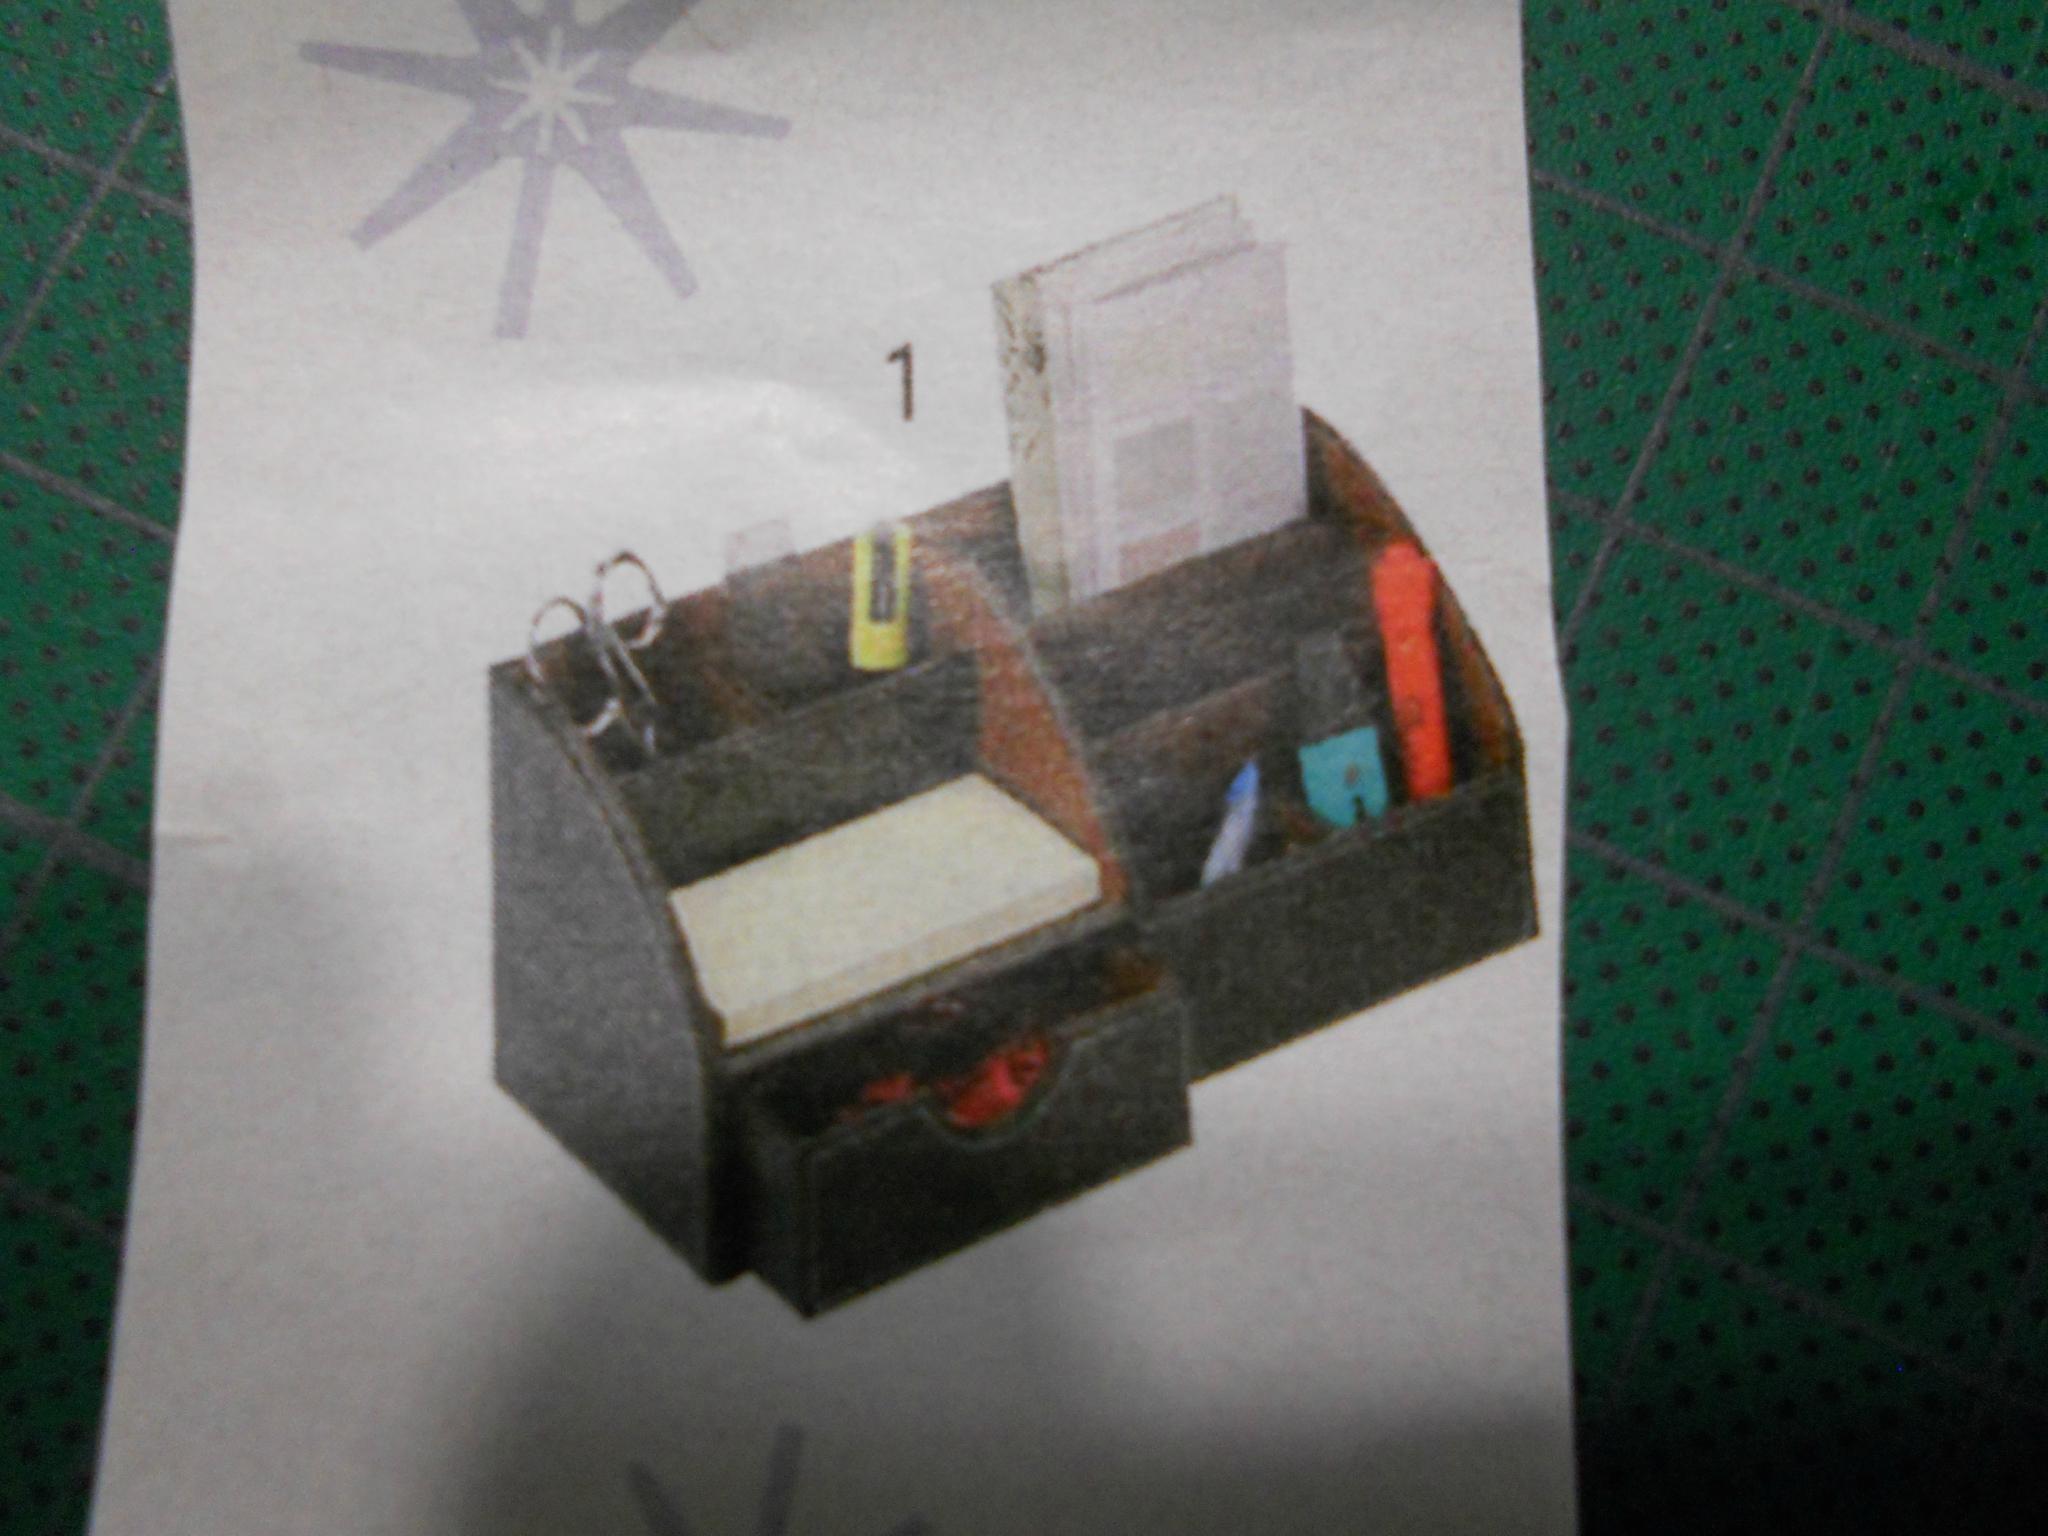 organisateur de bureau d d cartonne. Black Bedroom Furniture Sets. Home Design Ideas